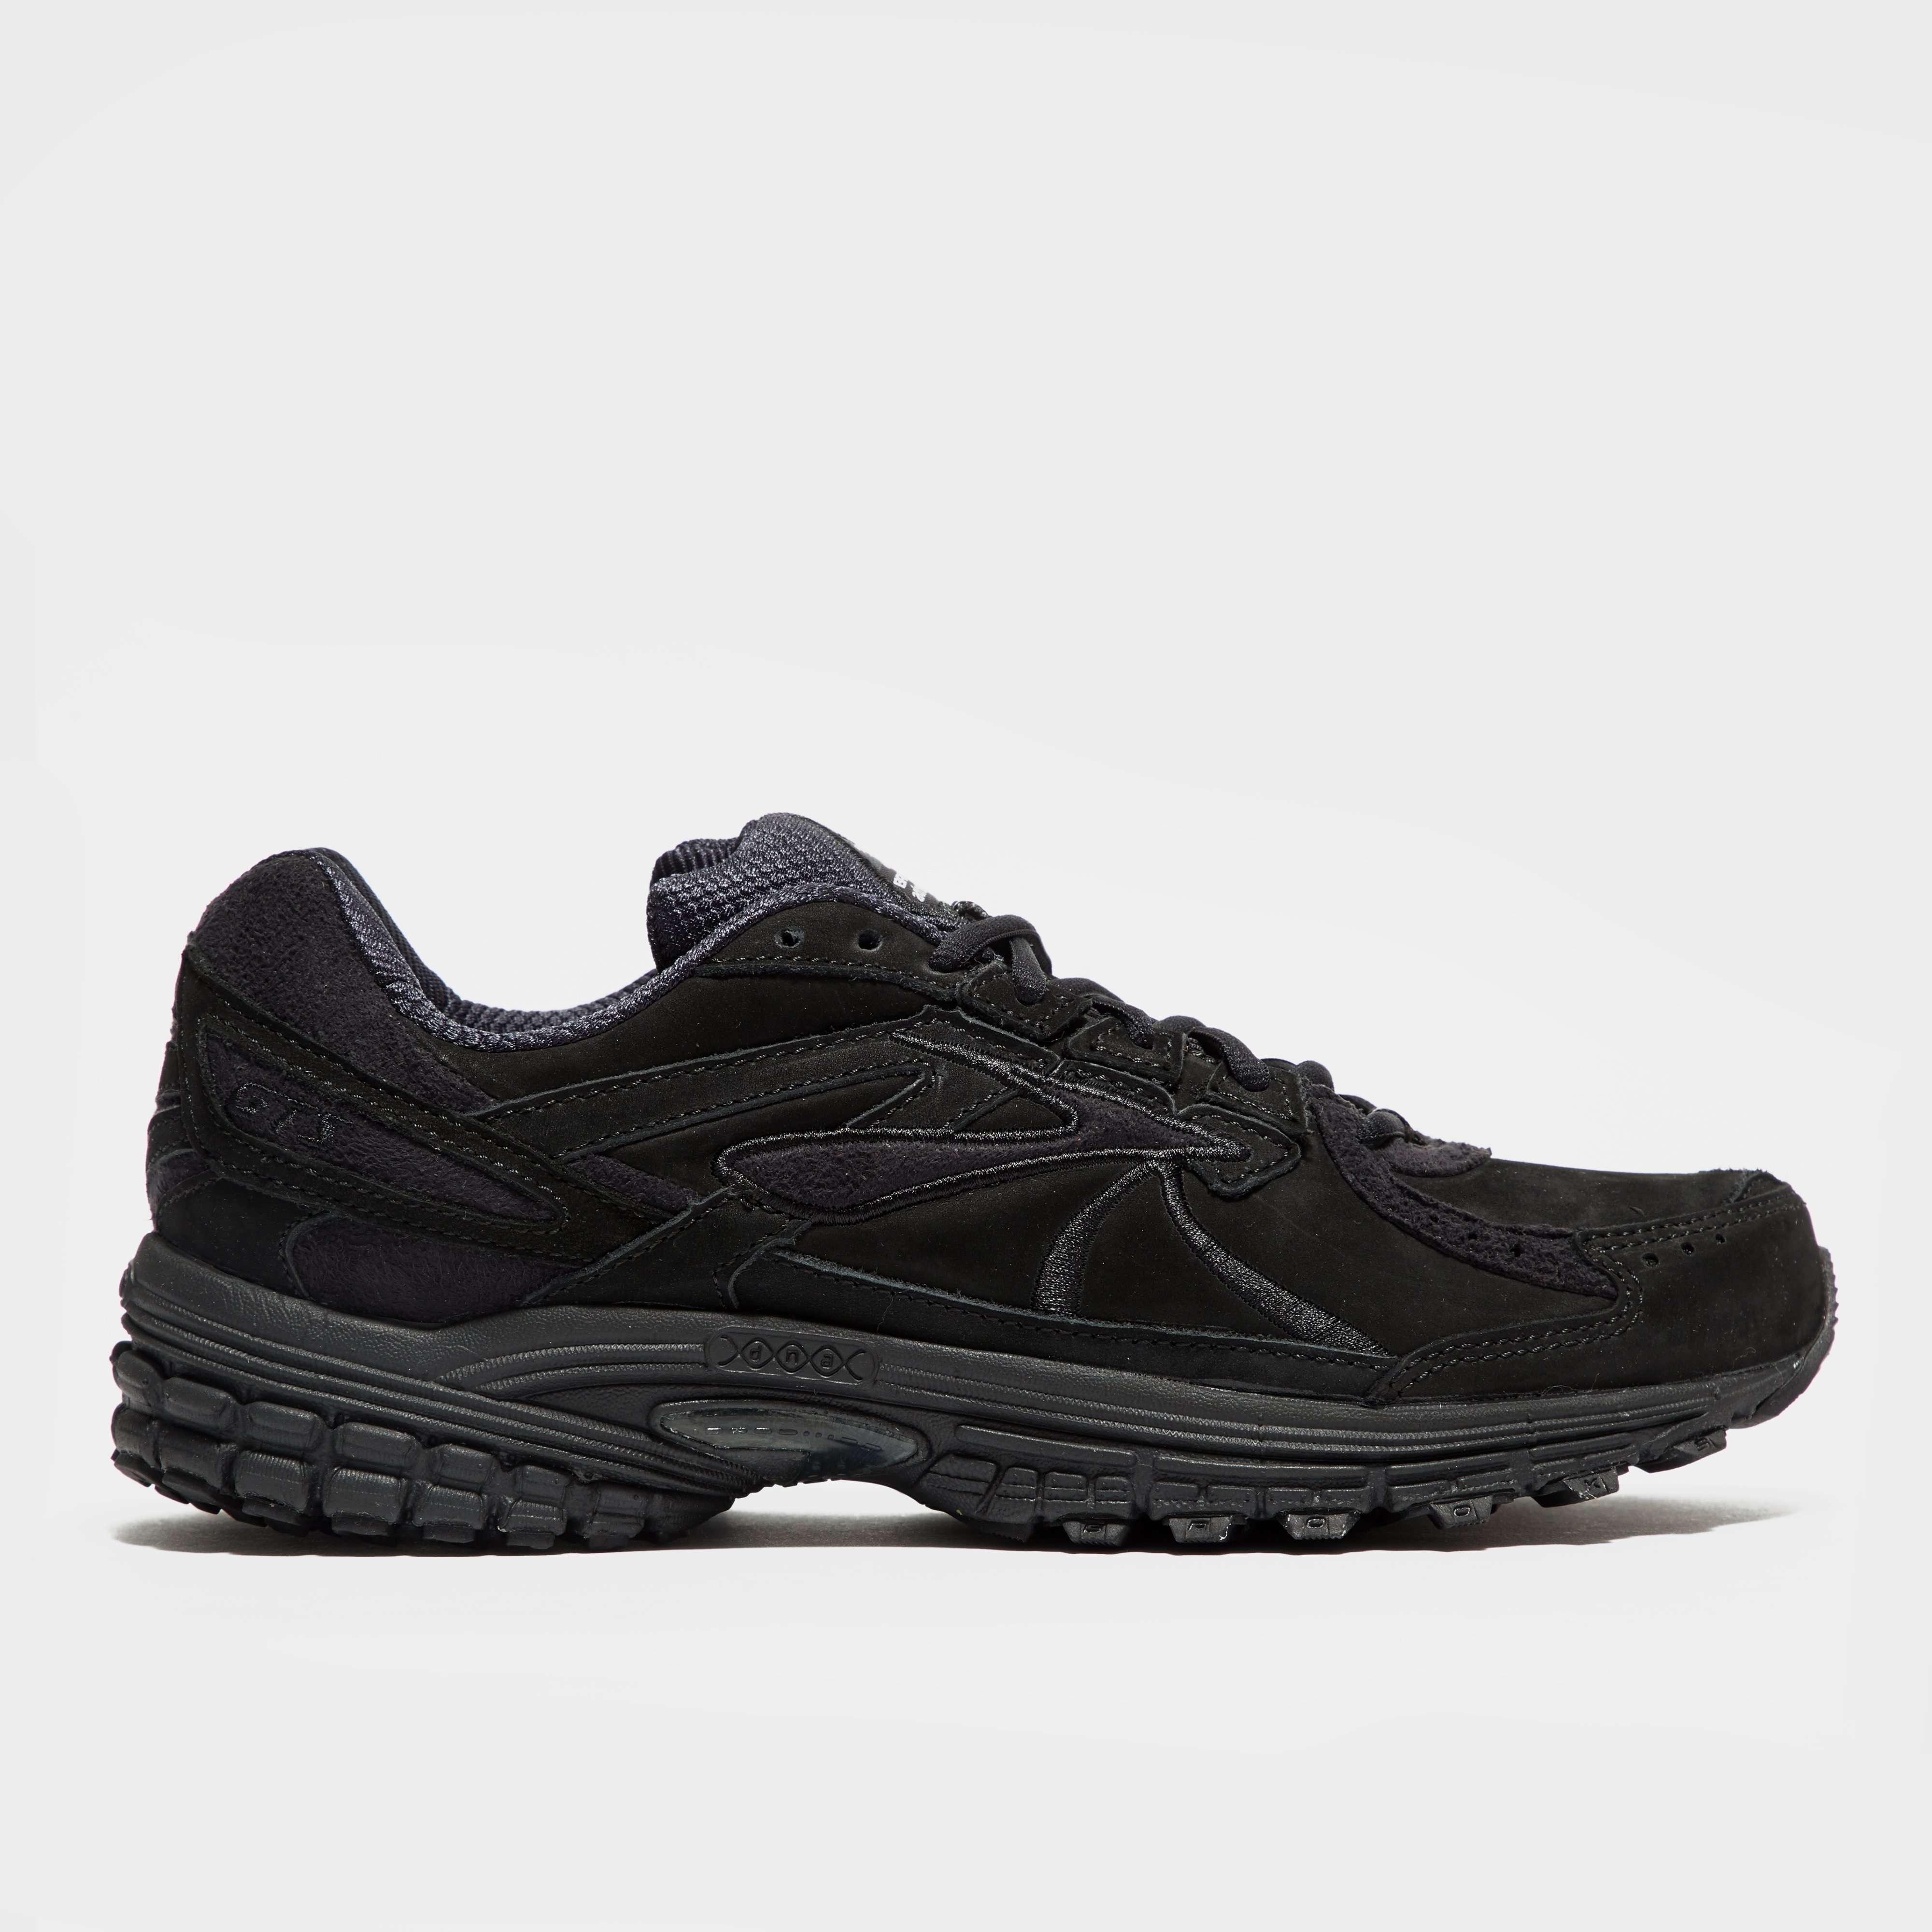 BROOKS Men's Adrenaline Walker Shoes